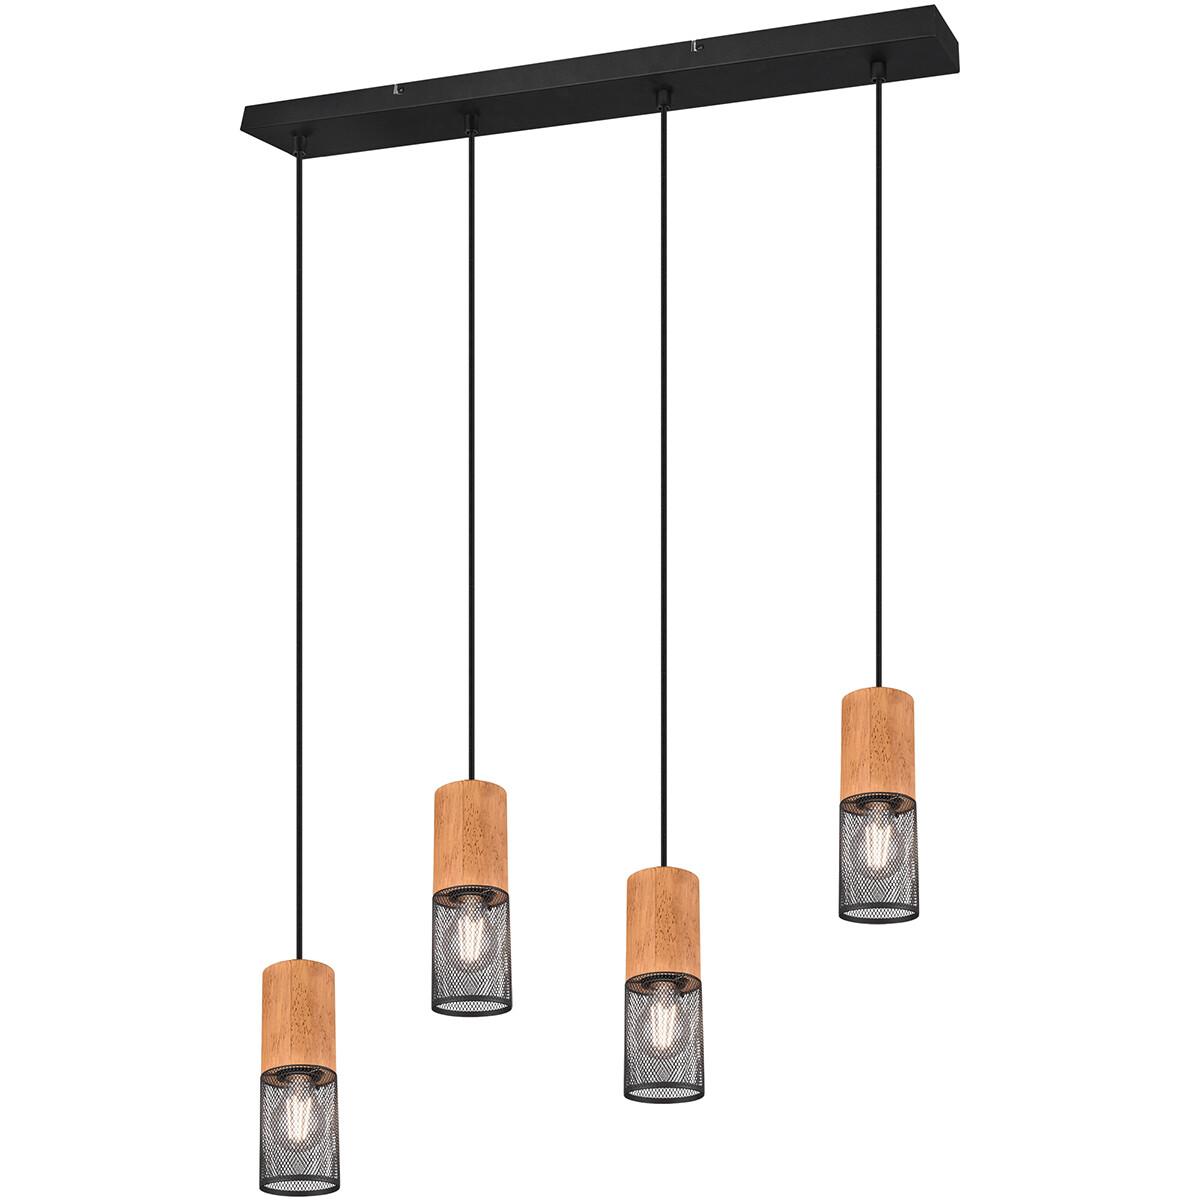 LED Hanglamp - Trion Yosh - E27 Fitting - 4-lichts - Rond - Mat Zwart - Aluminium